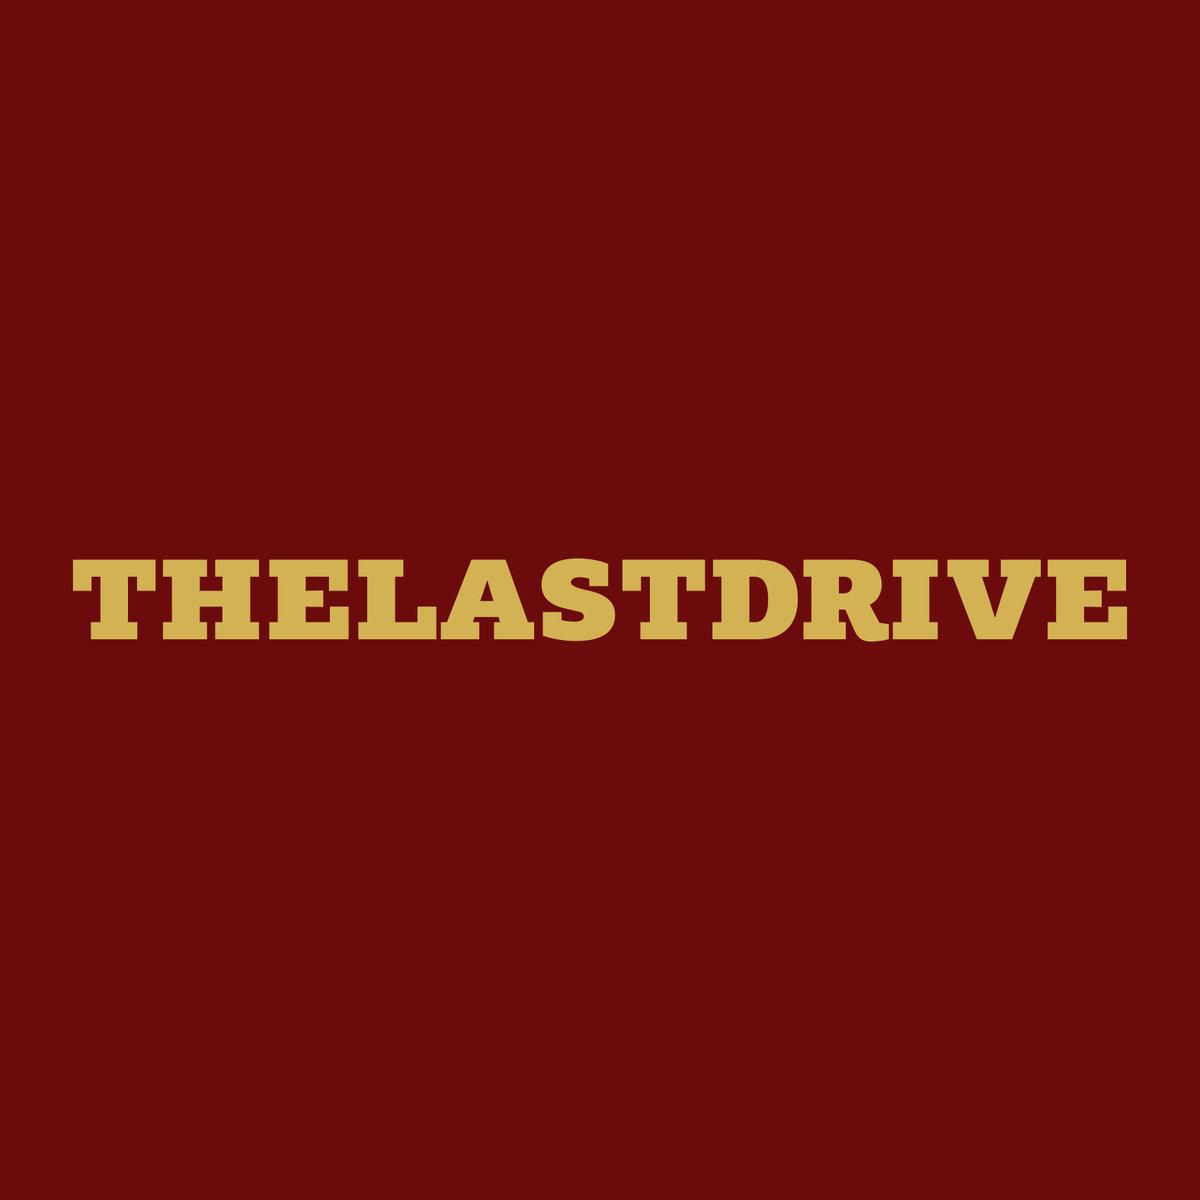 TheLastDrive